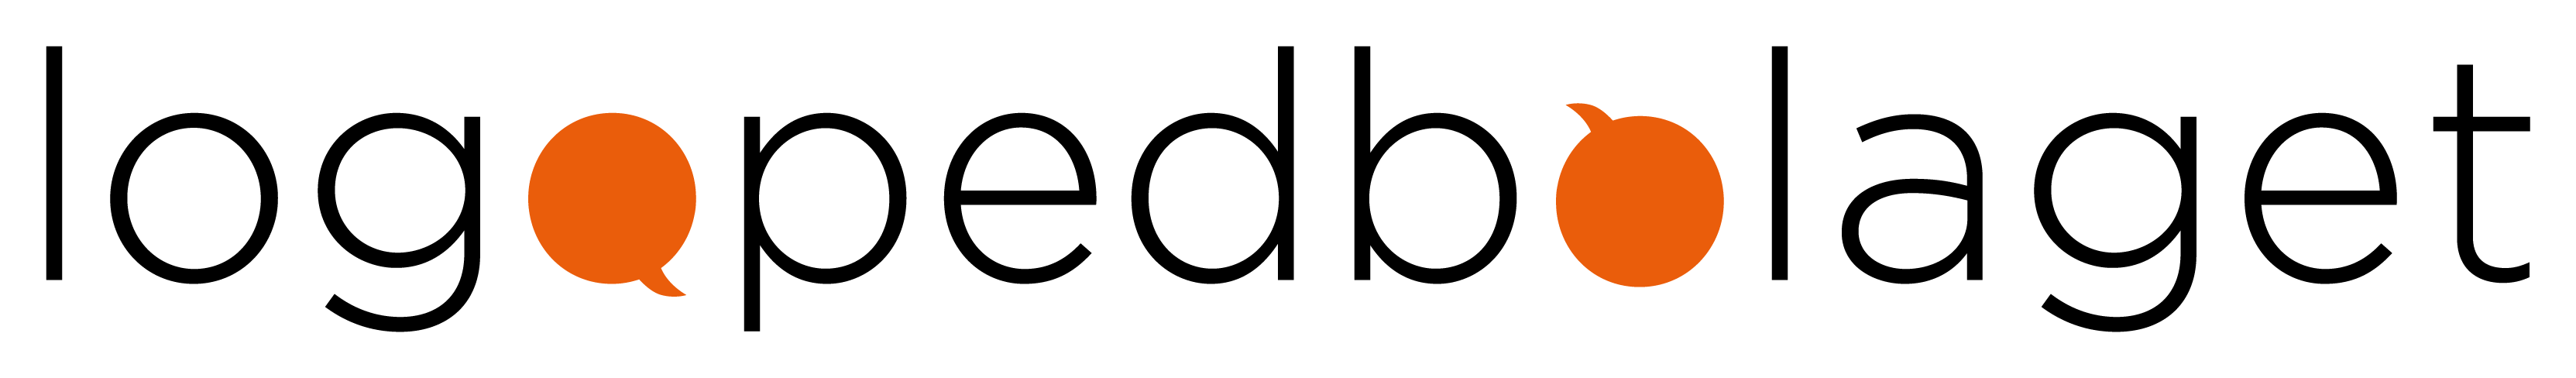 Logopedbolaget